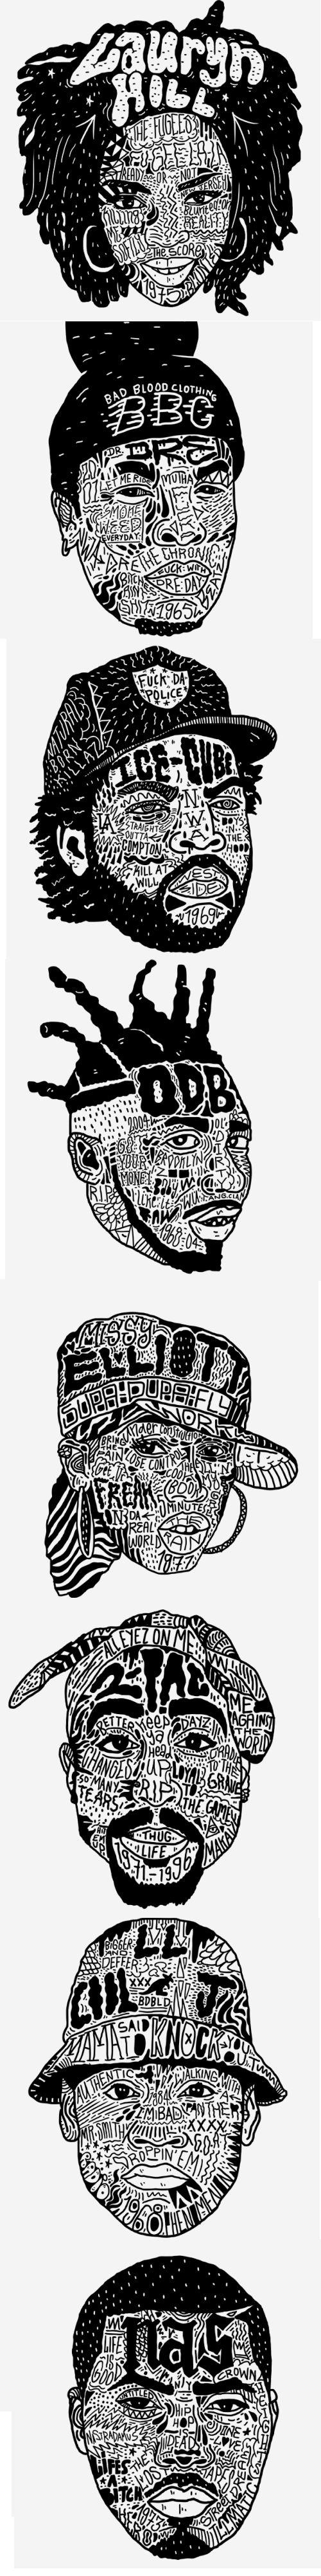 hip hop design | Selected by Brute Beats, Your hip hop station | #hiphop #rap #beats | brutebeats.com